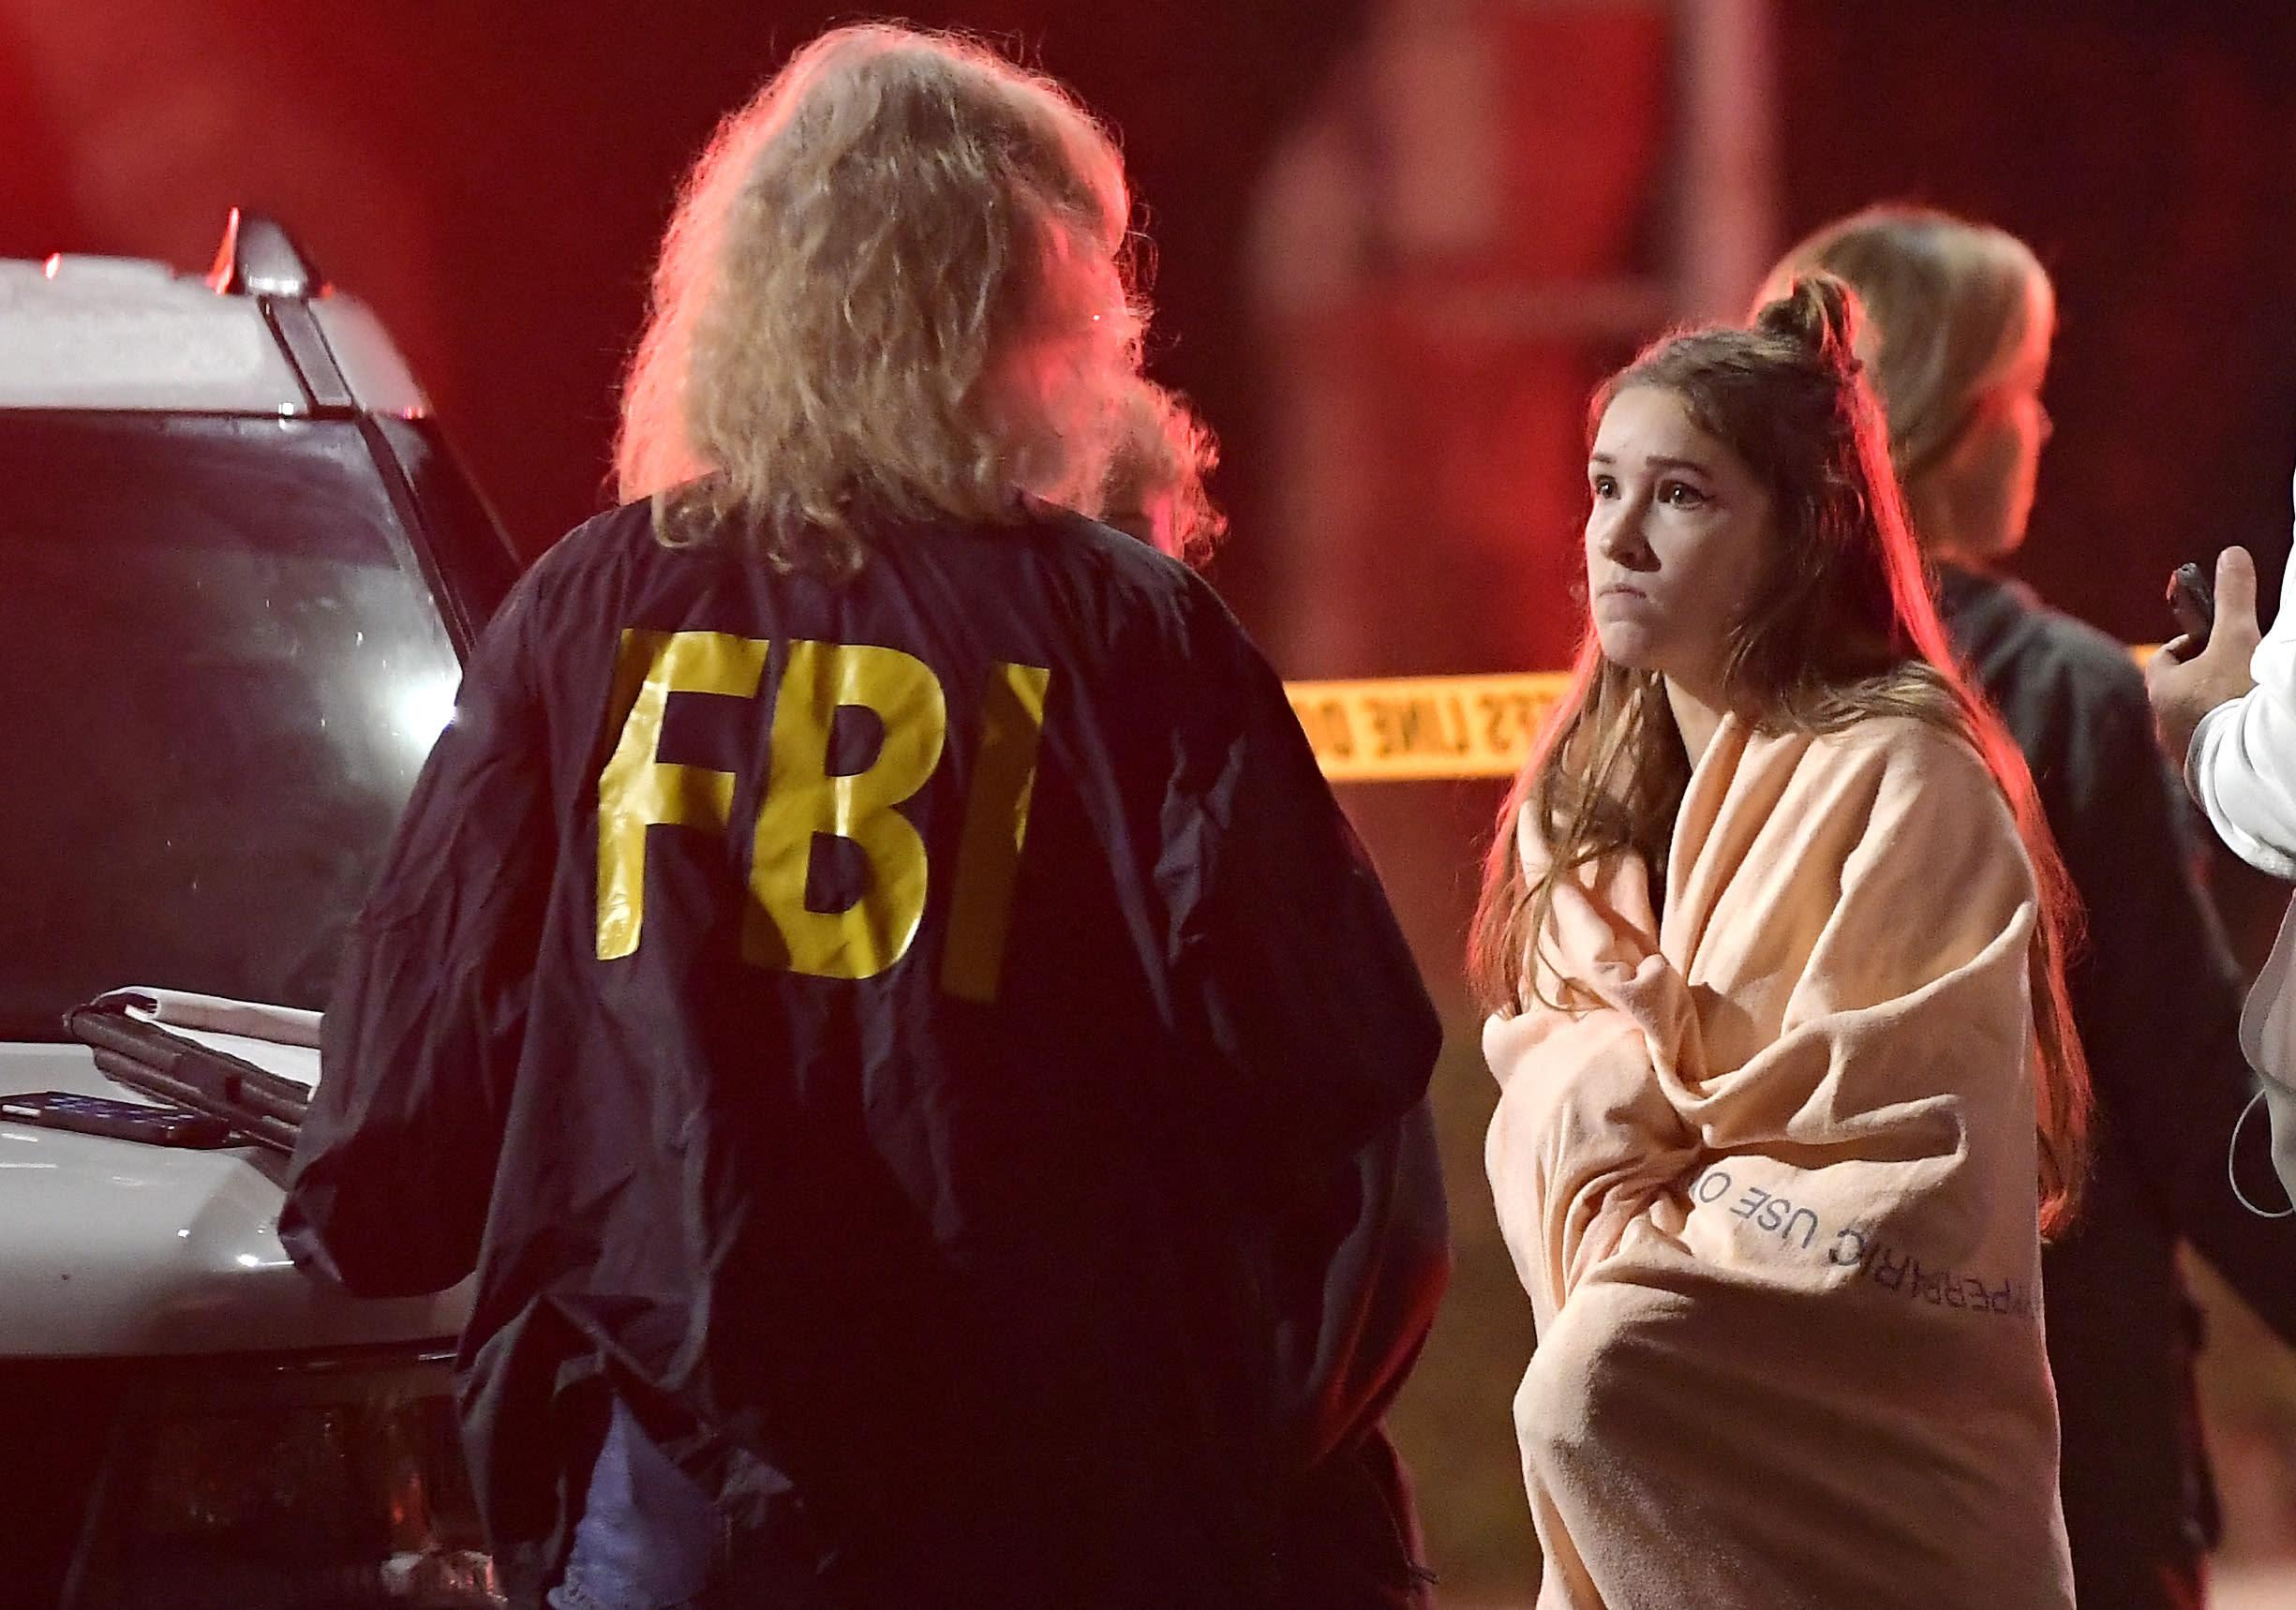 13 dead including gunman in shooting at California bar